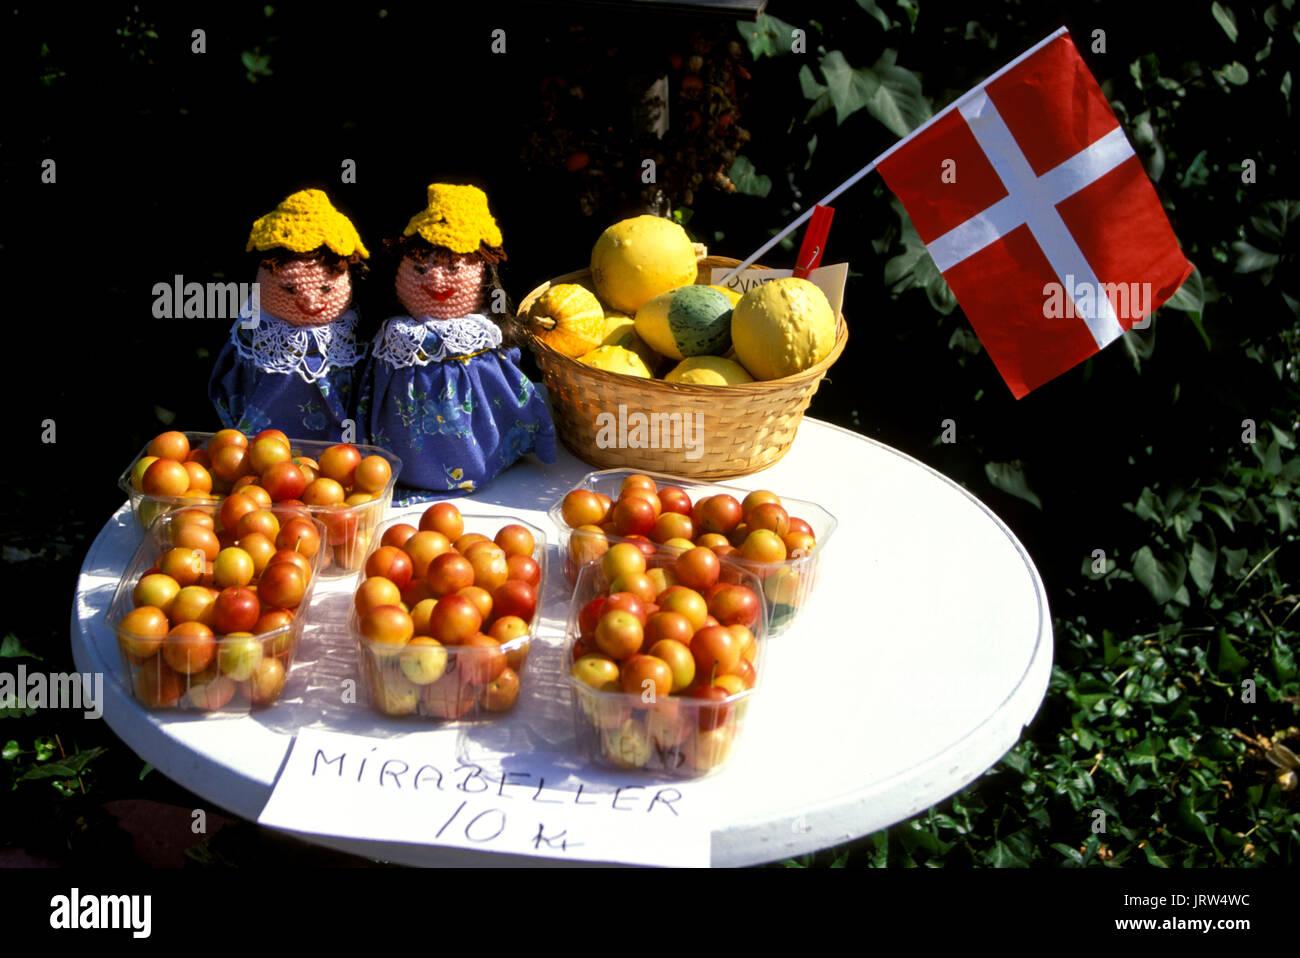 Street shop, Fyn, Denmark, Scandinavia, Europe - Stock Image